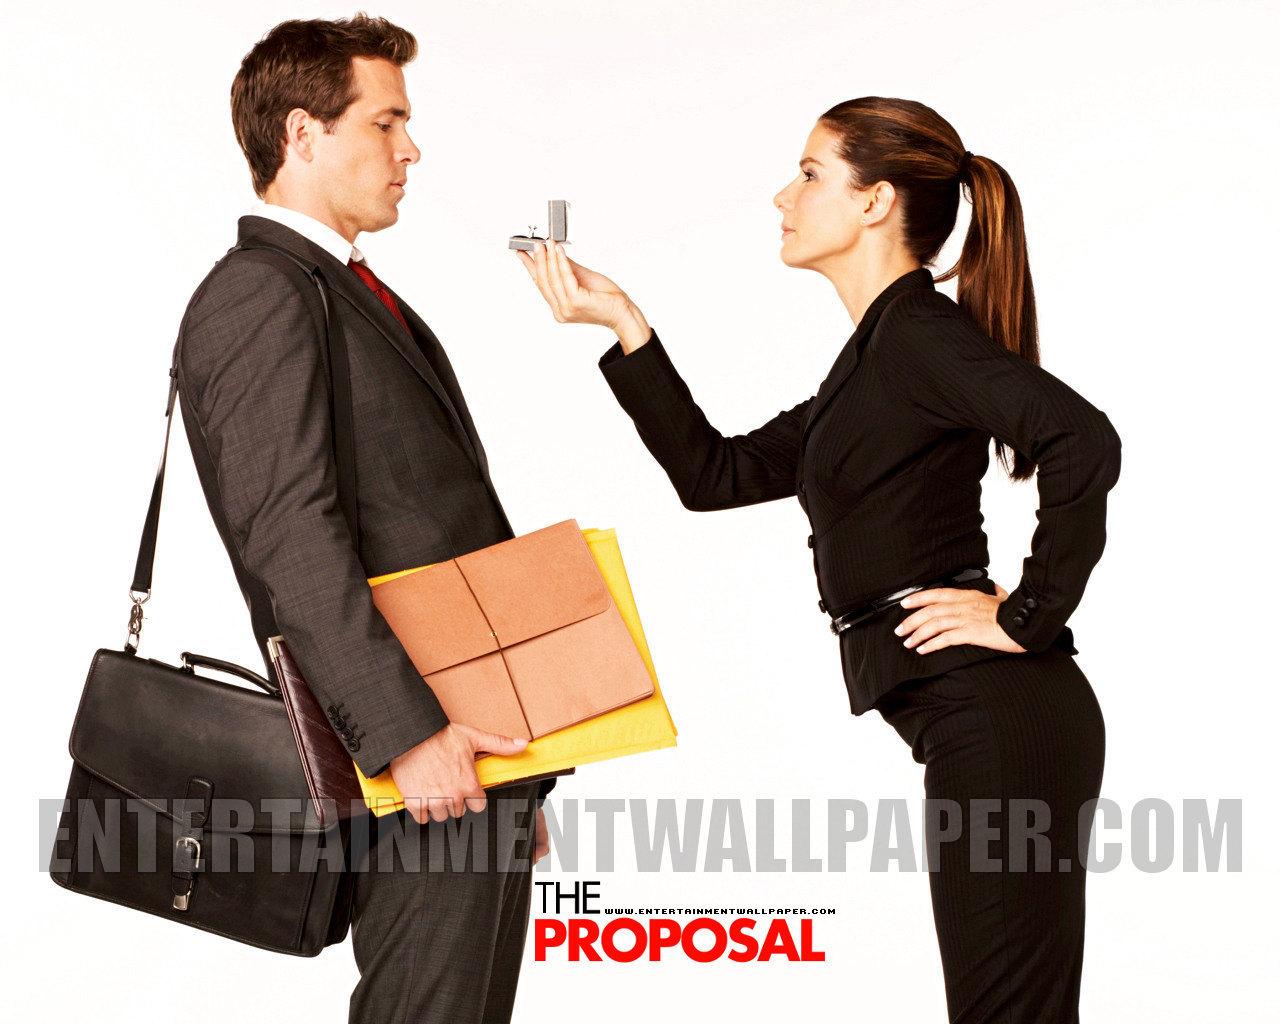 http://2.bp.blogspot.com/_XewAIWKhznM/SqDmKXTOX2I/AAAAAAAAB3w/rUTZXWal858/s1600/The+proposal.jpg